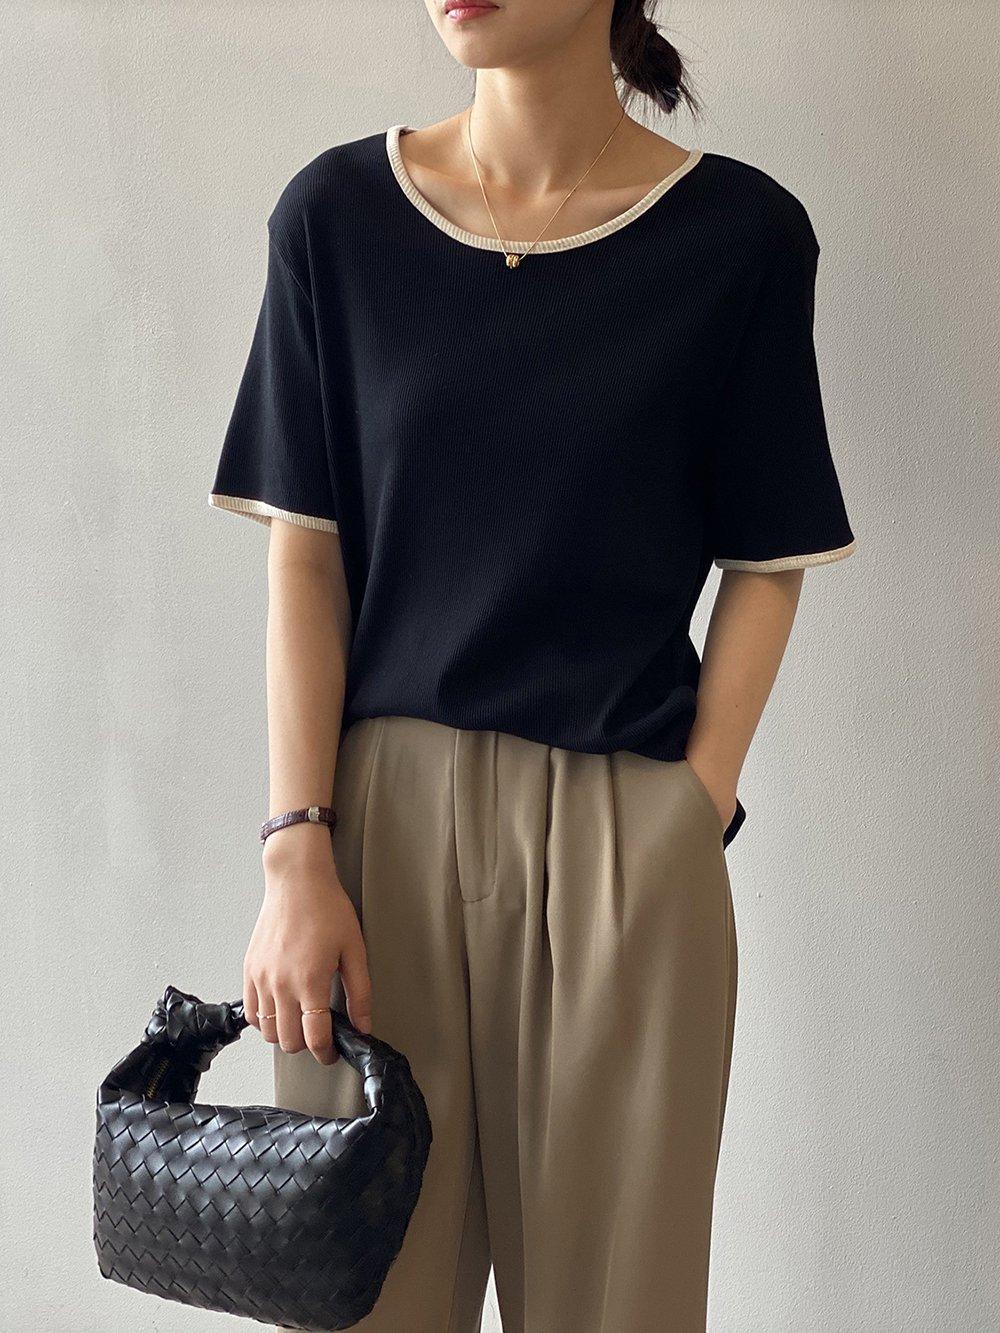 _k297-49【広州仕入れ】カジュアルラウンドカラー半袖Tシャツ